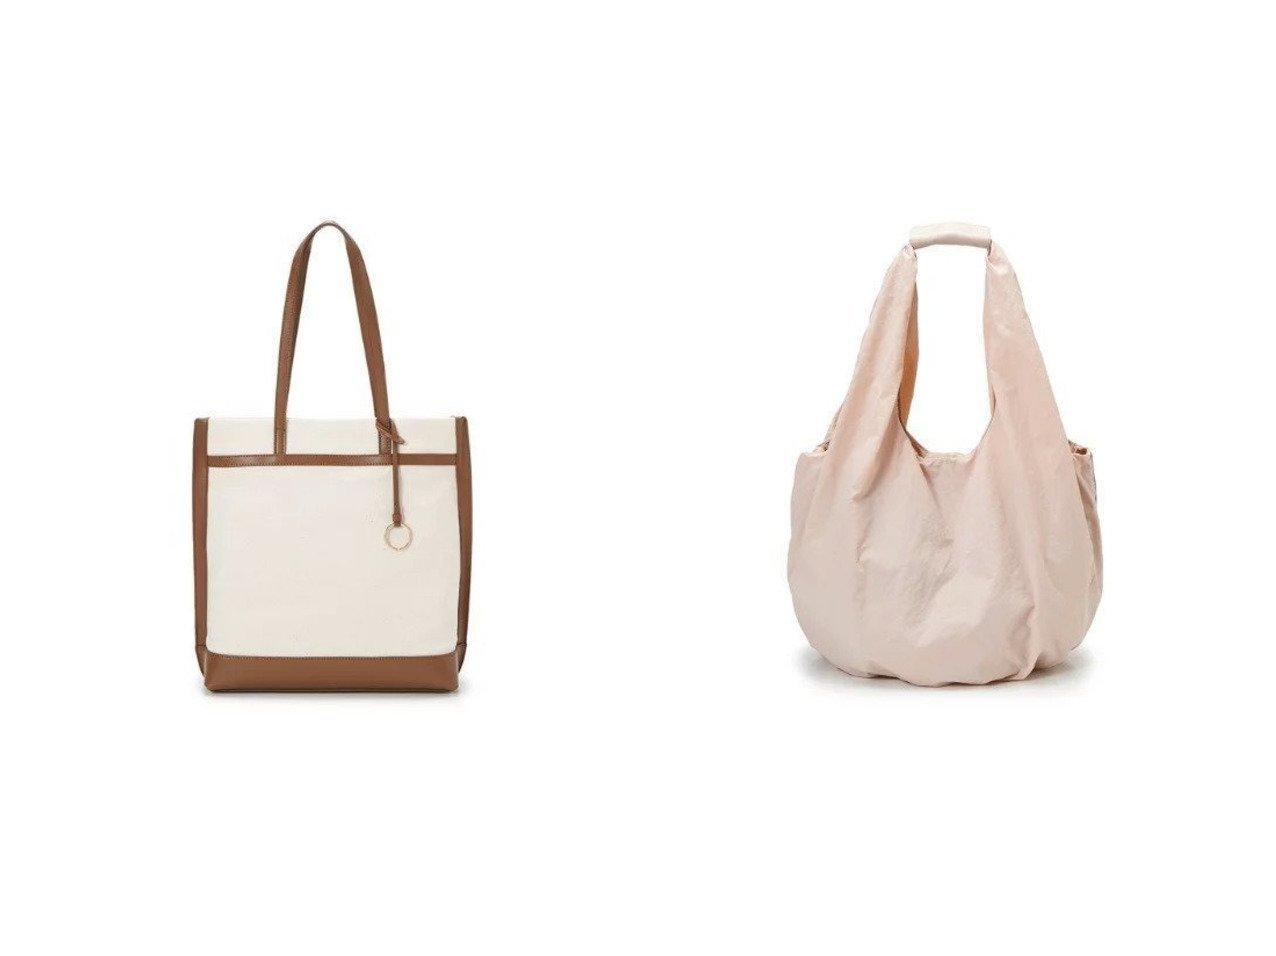 【TOPKAPI/トプカピ】のレザーコンビ キャンバス A4トートバッグ&シャーリング ナイロンバッグ バッグ・鞄のおすすめ!人気、トレンド・レディースファッションの通販 おすすめで人気の流行・トレンド、ファッションの通販商品 メンズファッション・キッズファッション・インテリア・家具・レディースファッション・服の通販 founy(ファニー) https://founy.com/ ファッション Fashion レディースファッション WOMEN バッグ Bag キャンバス コンビ シンプル ギャザー コンパクト シャーリング  ID:crp329100000014483